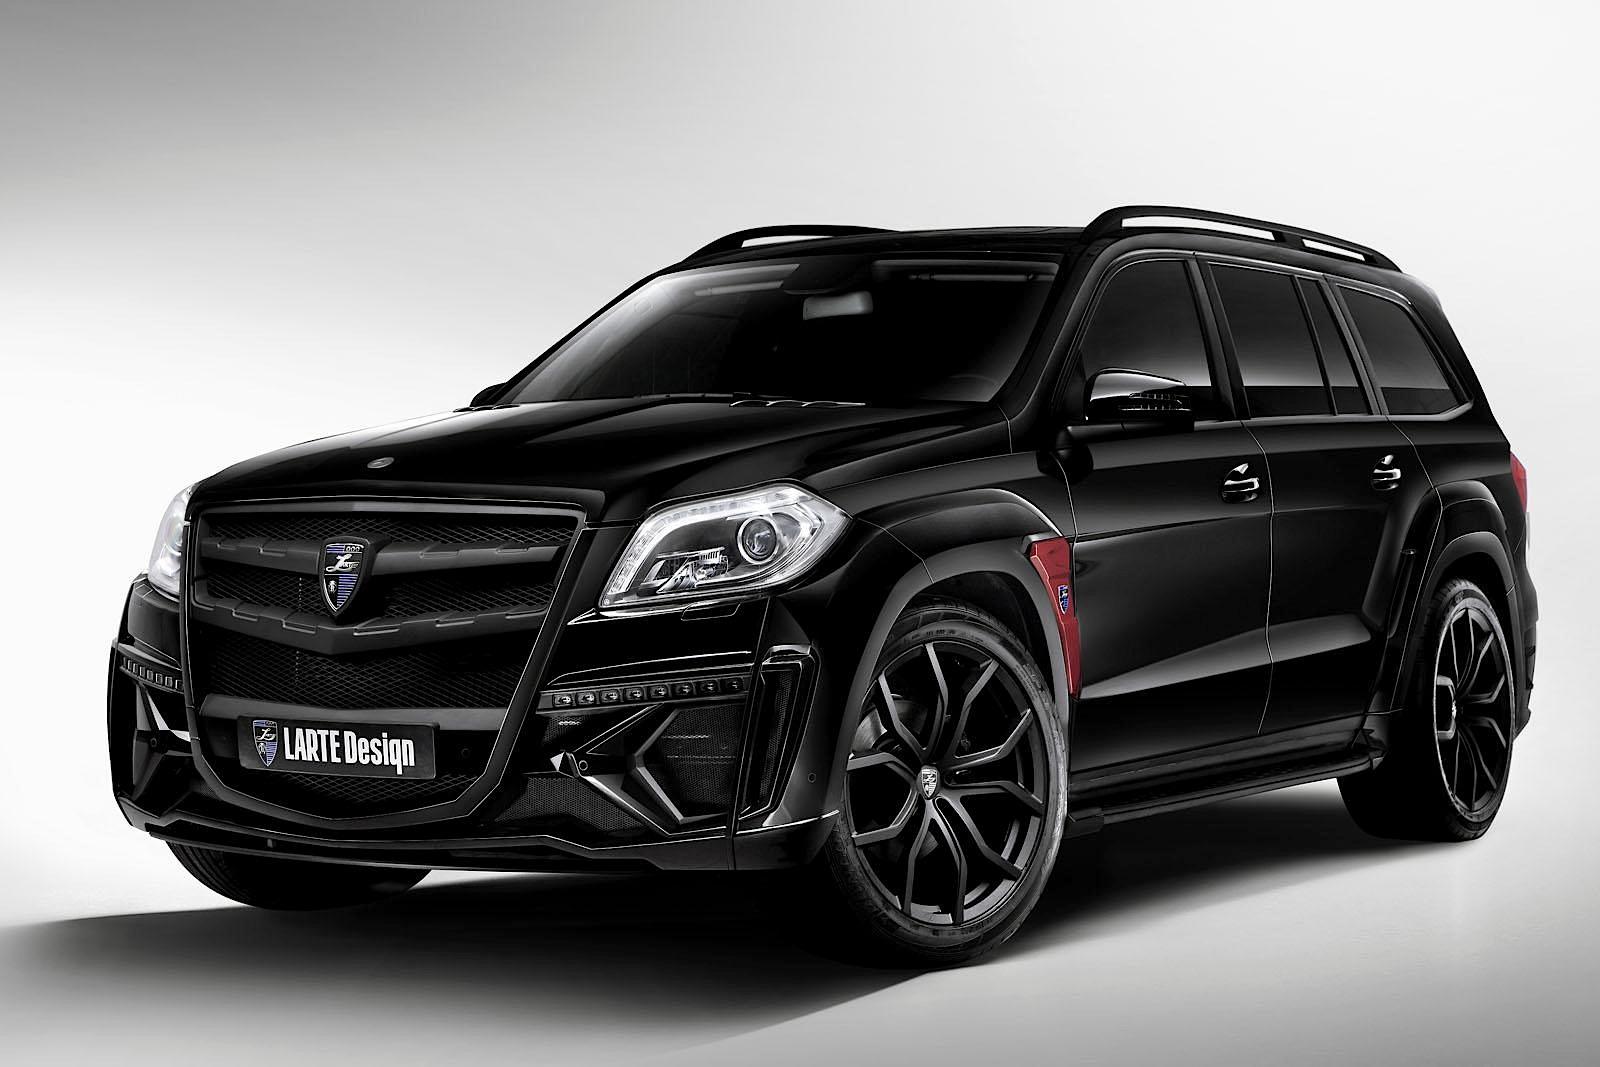 Larte design 39 s mercedes benz gl class has joined the dark for Mercedes benz gl class luxury suv